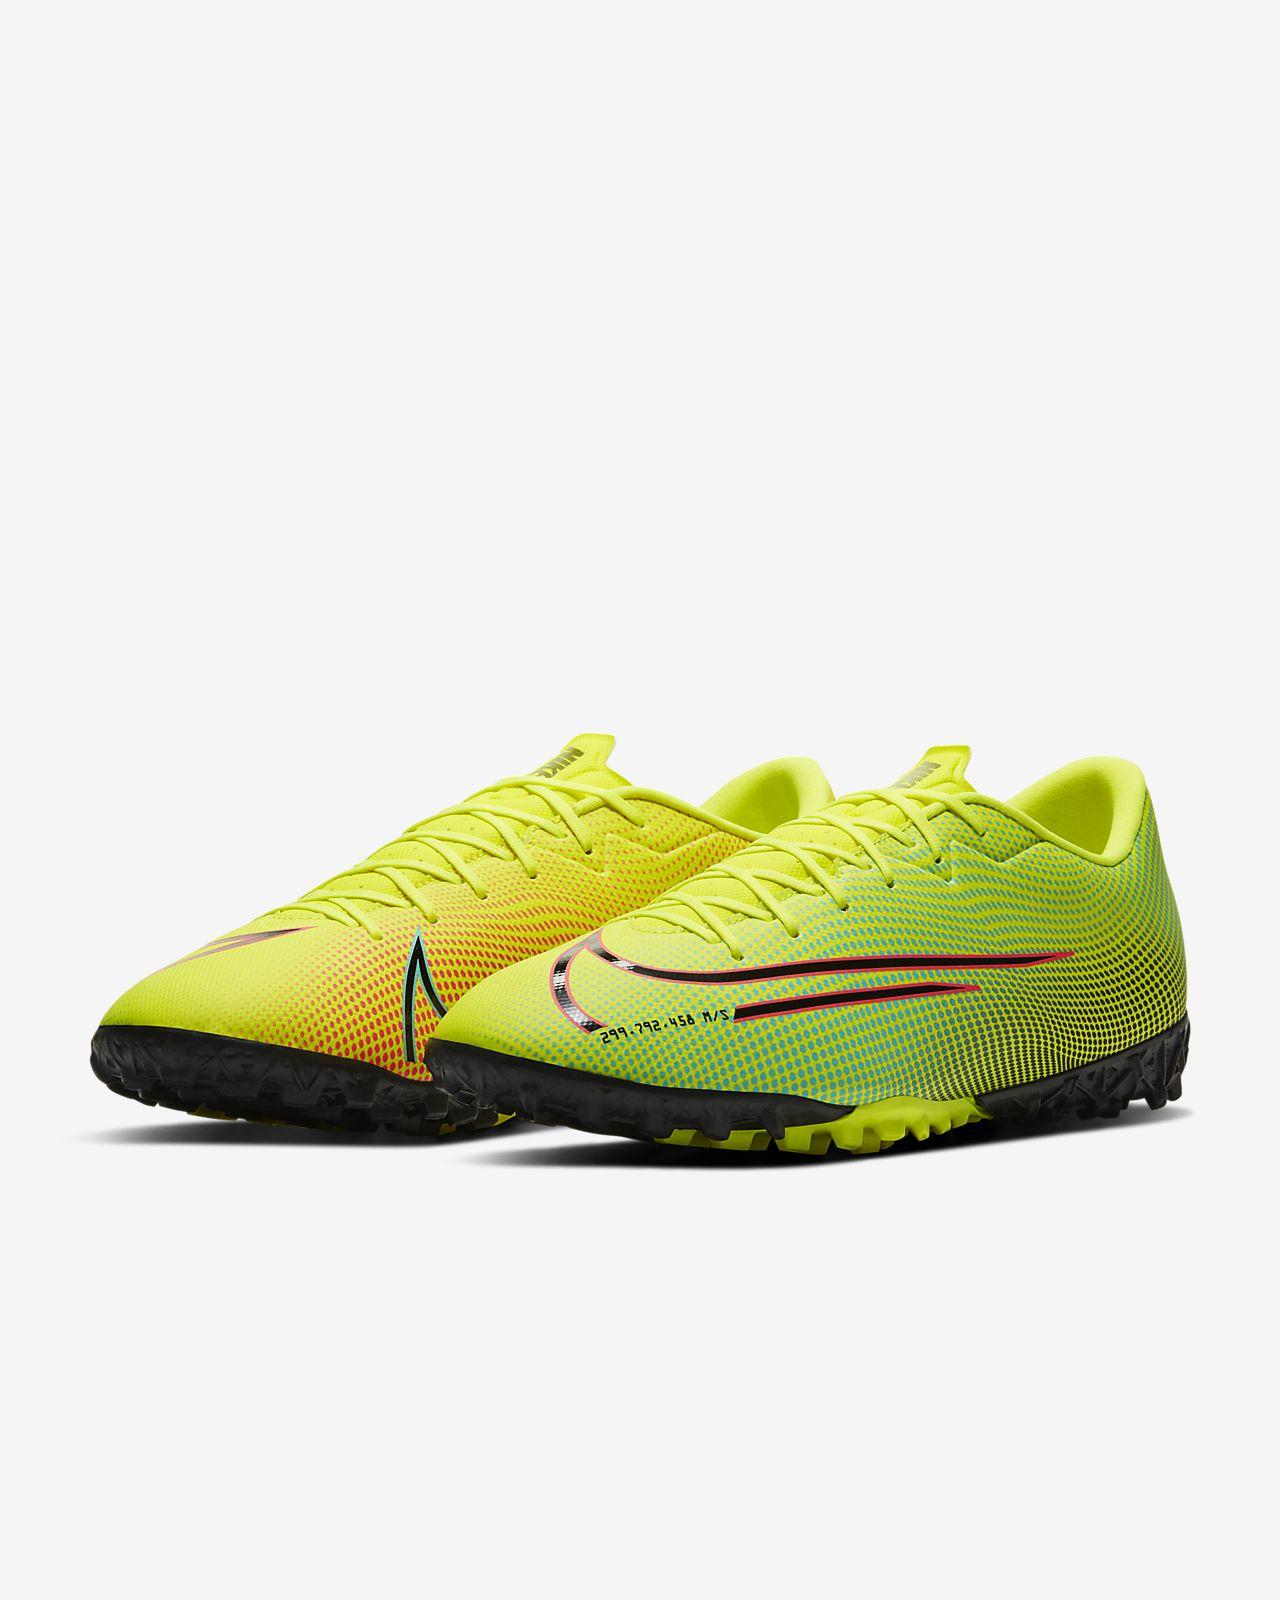 Nike Mercurial Vapor 13 Academy MDS TF Artificial Turf Football Shoe